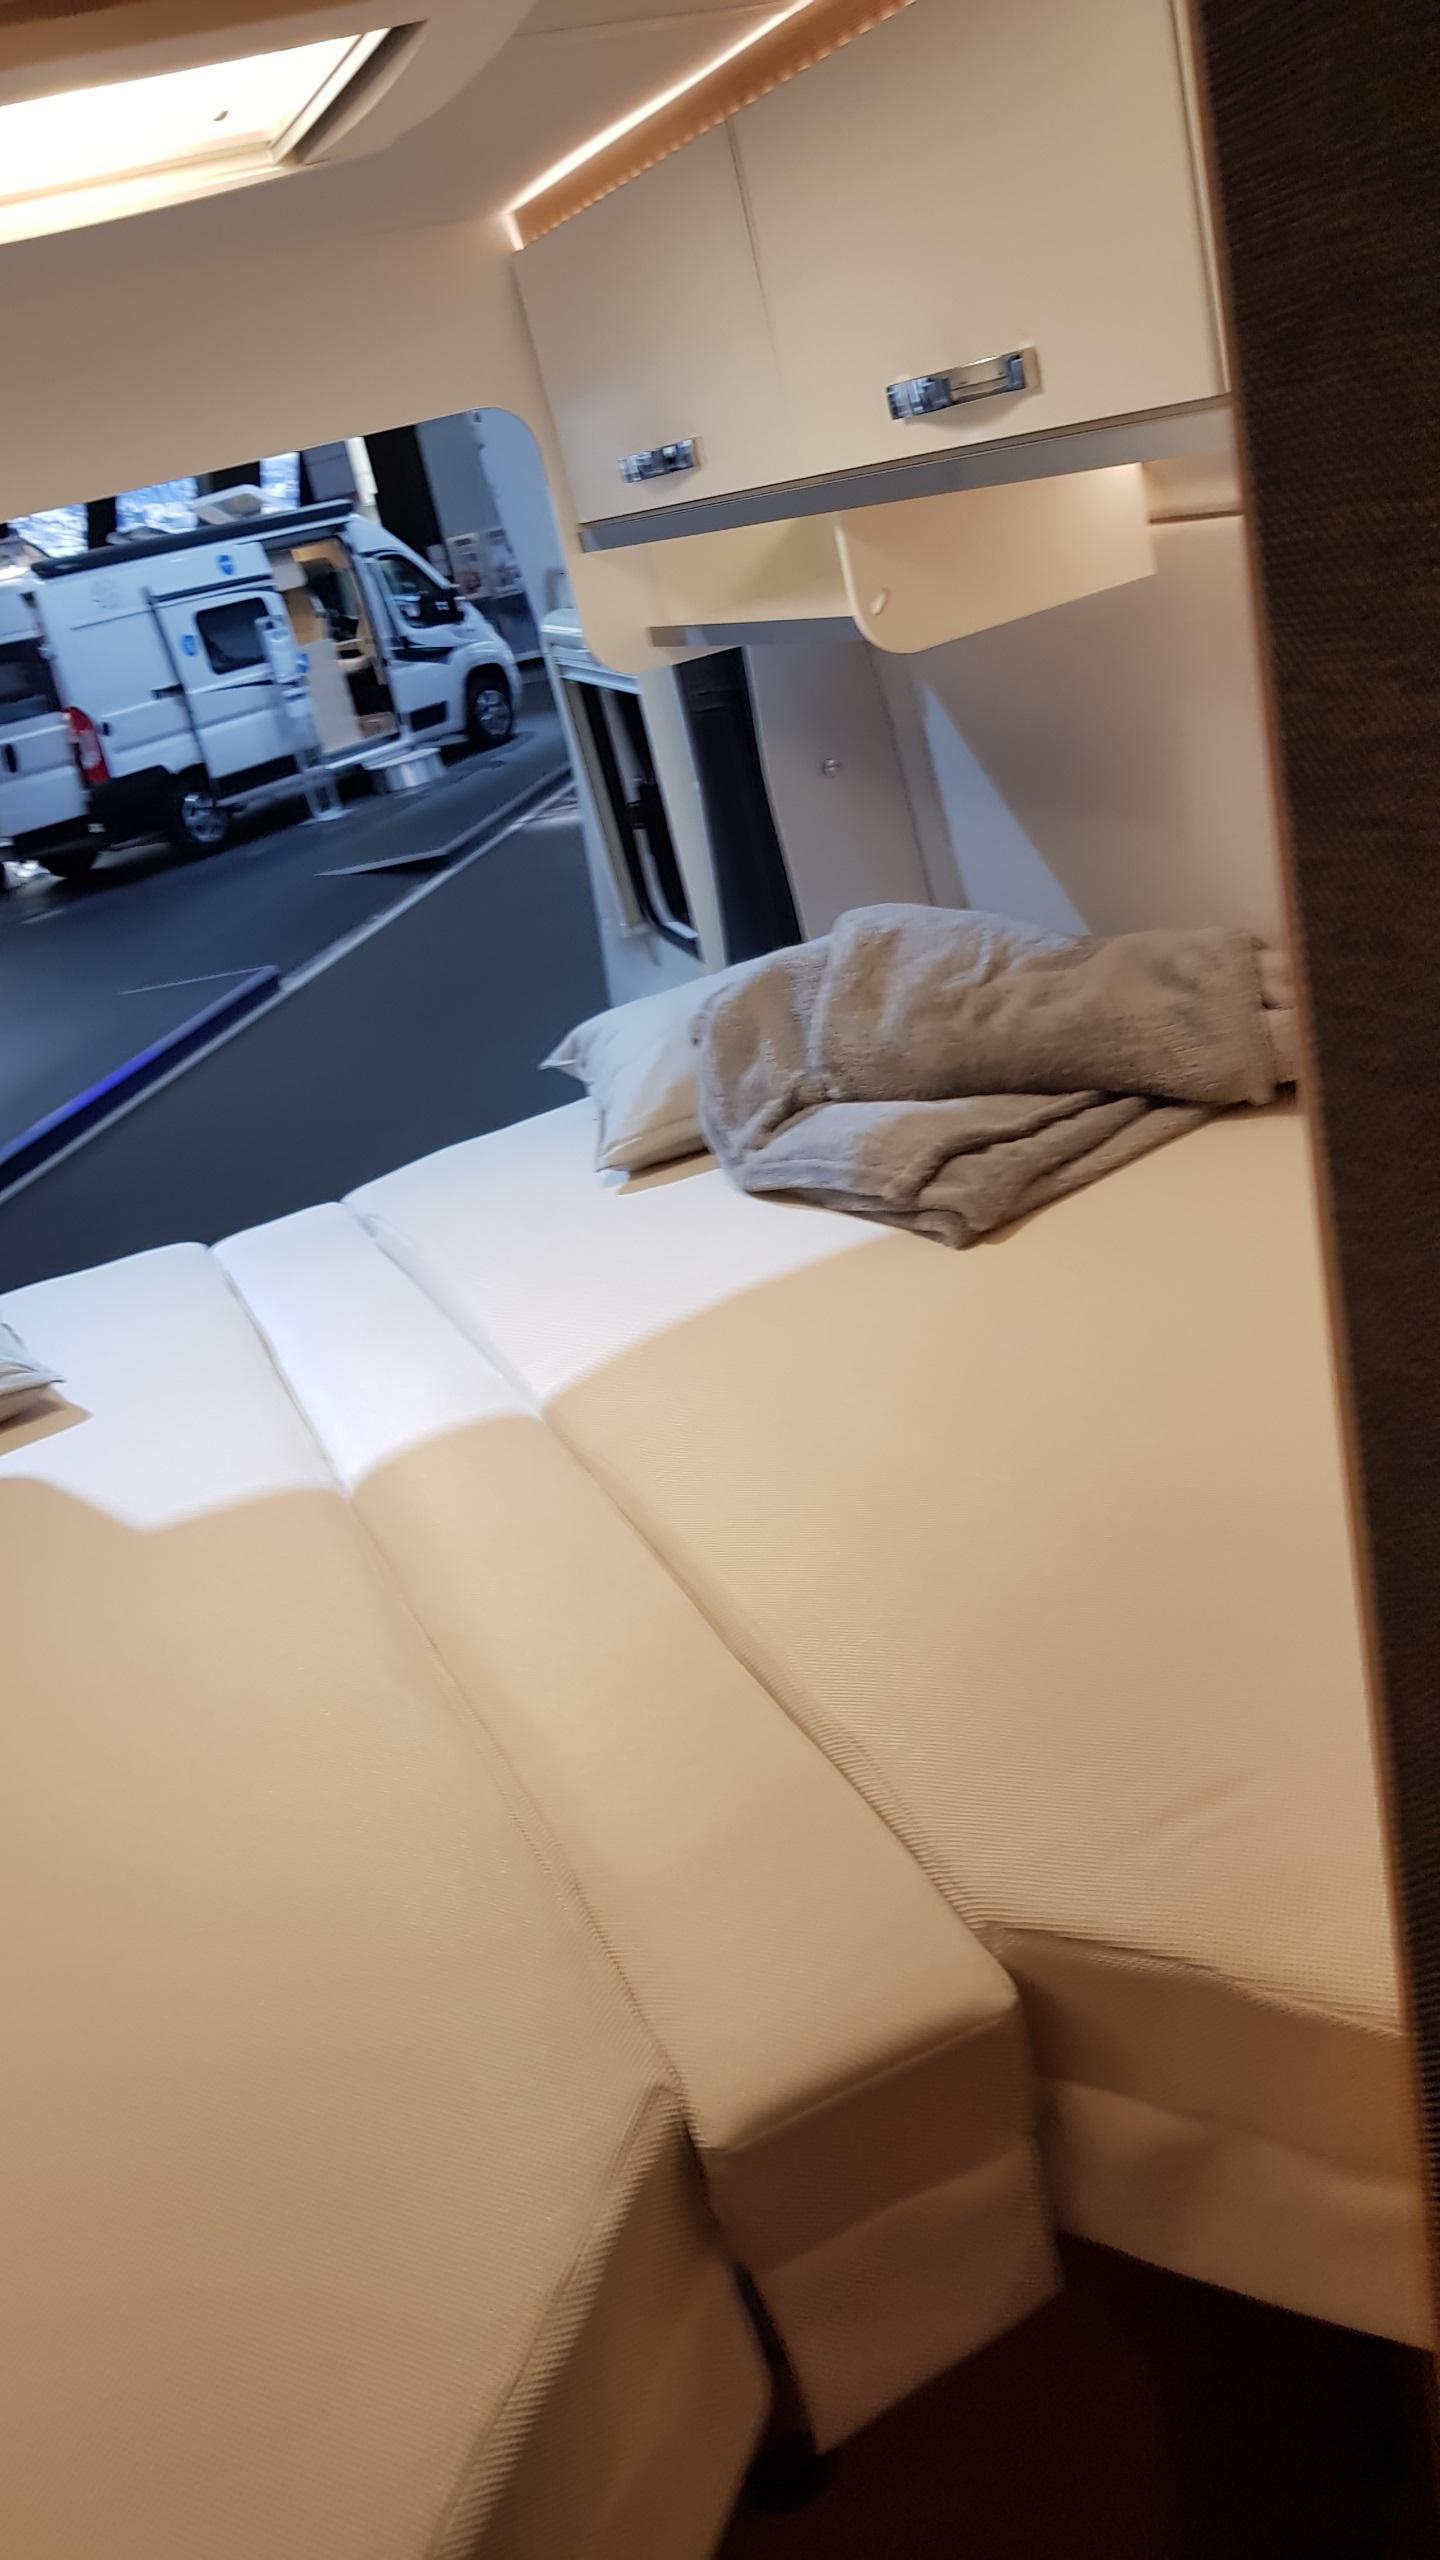 Verhuur Buscamper Lengte bedden 6,36 Lang Weinsberg-Caratour 630 ME Type 3